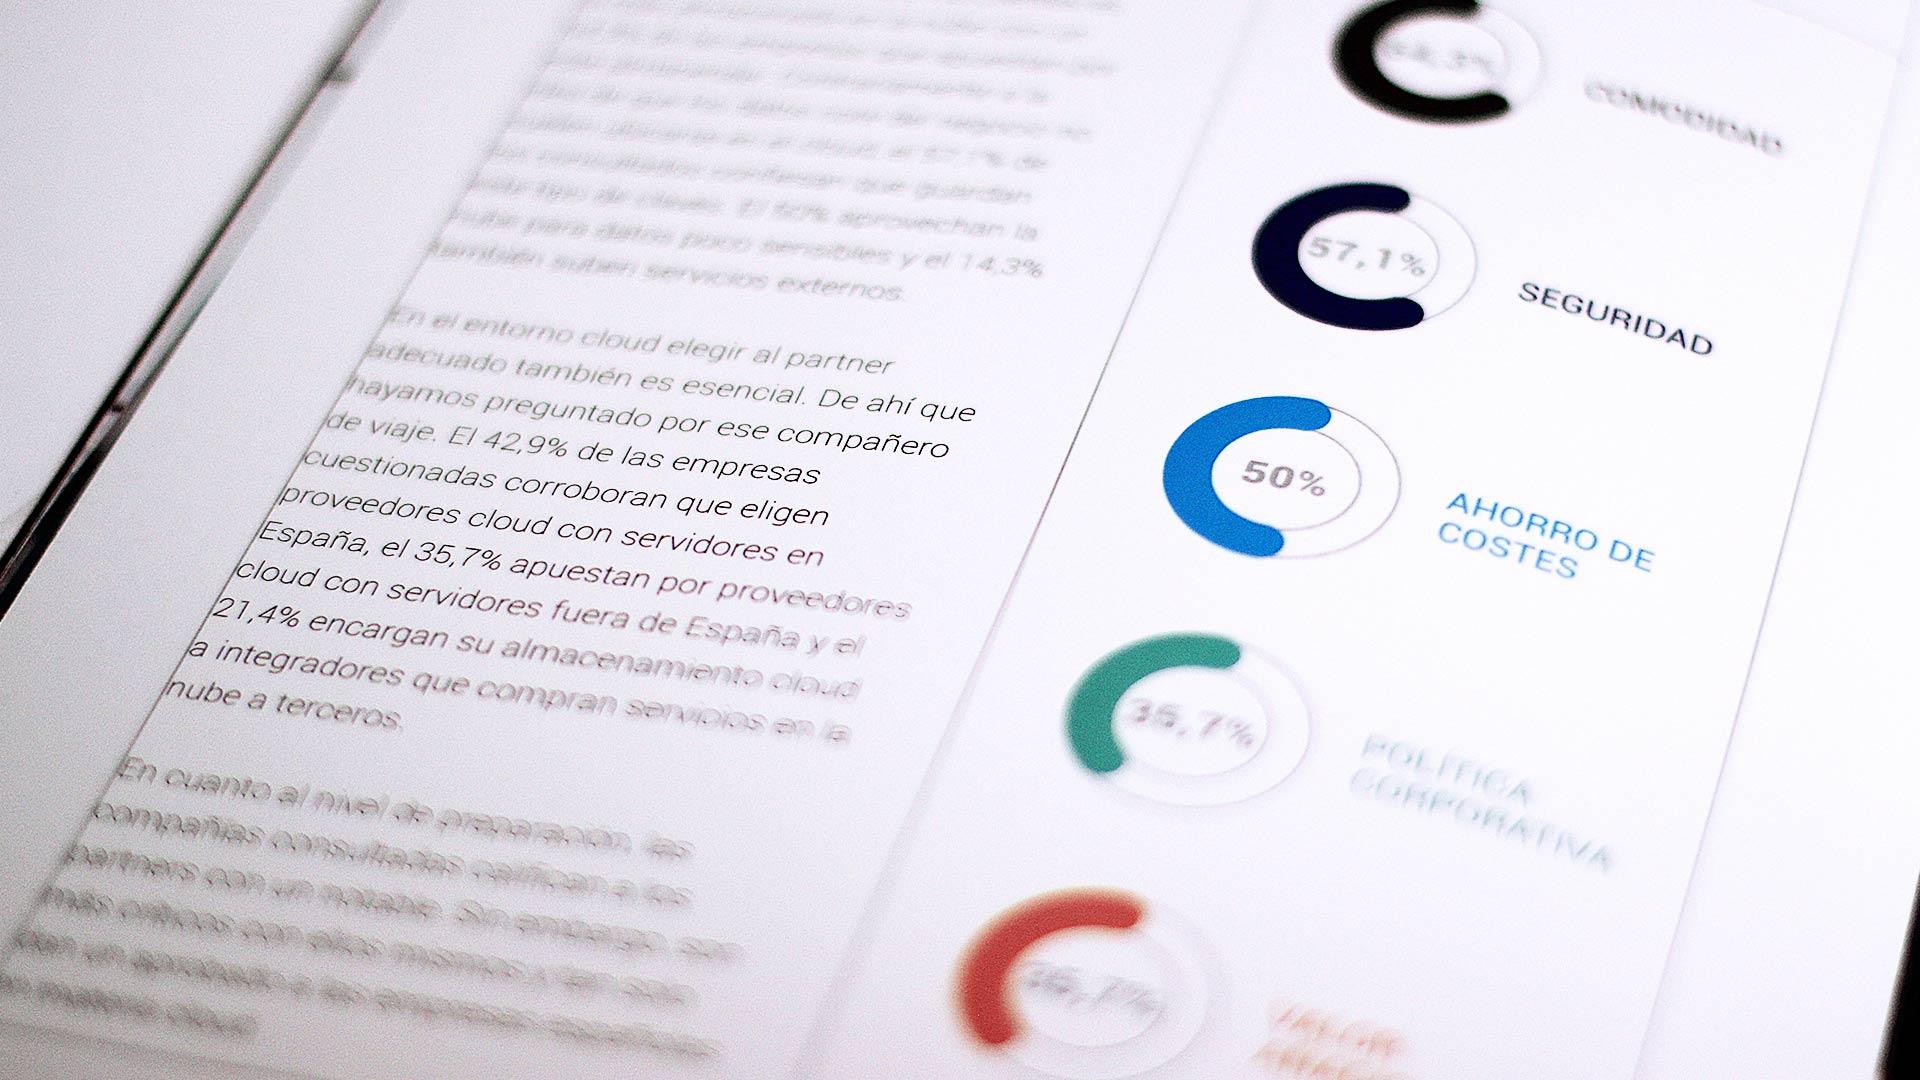 netapp-mediacloud-content-marketing-informe-resumen-ejecutivo-ebook-2017-16